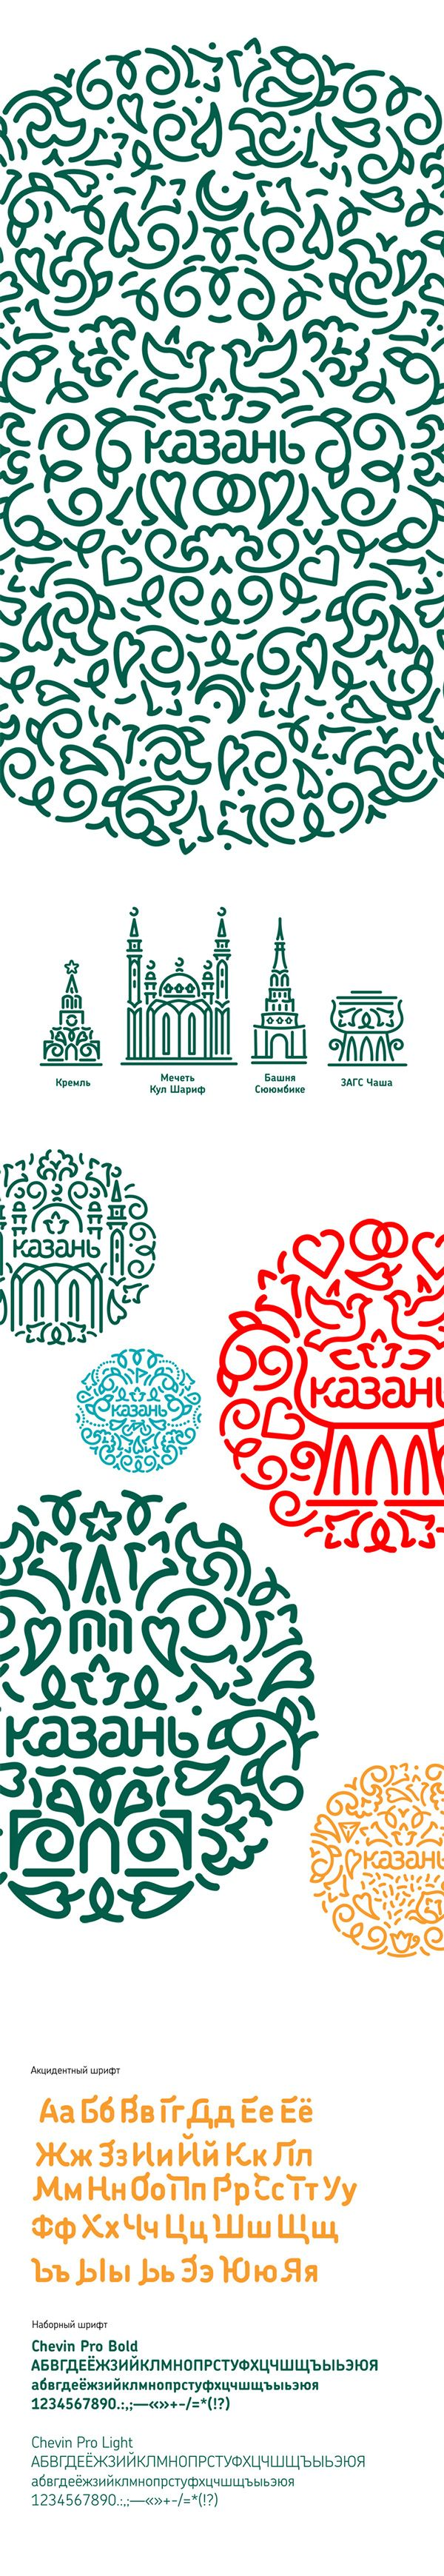 KAZAN identity on Behance